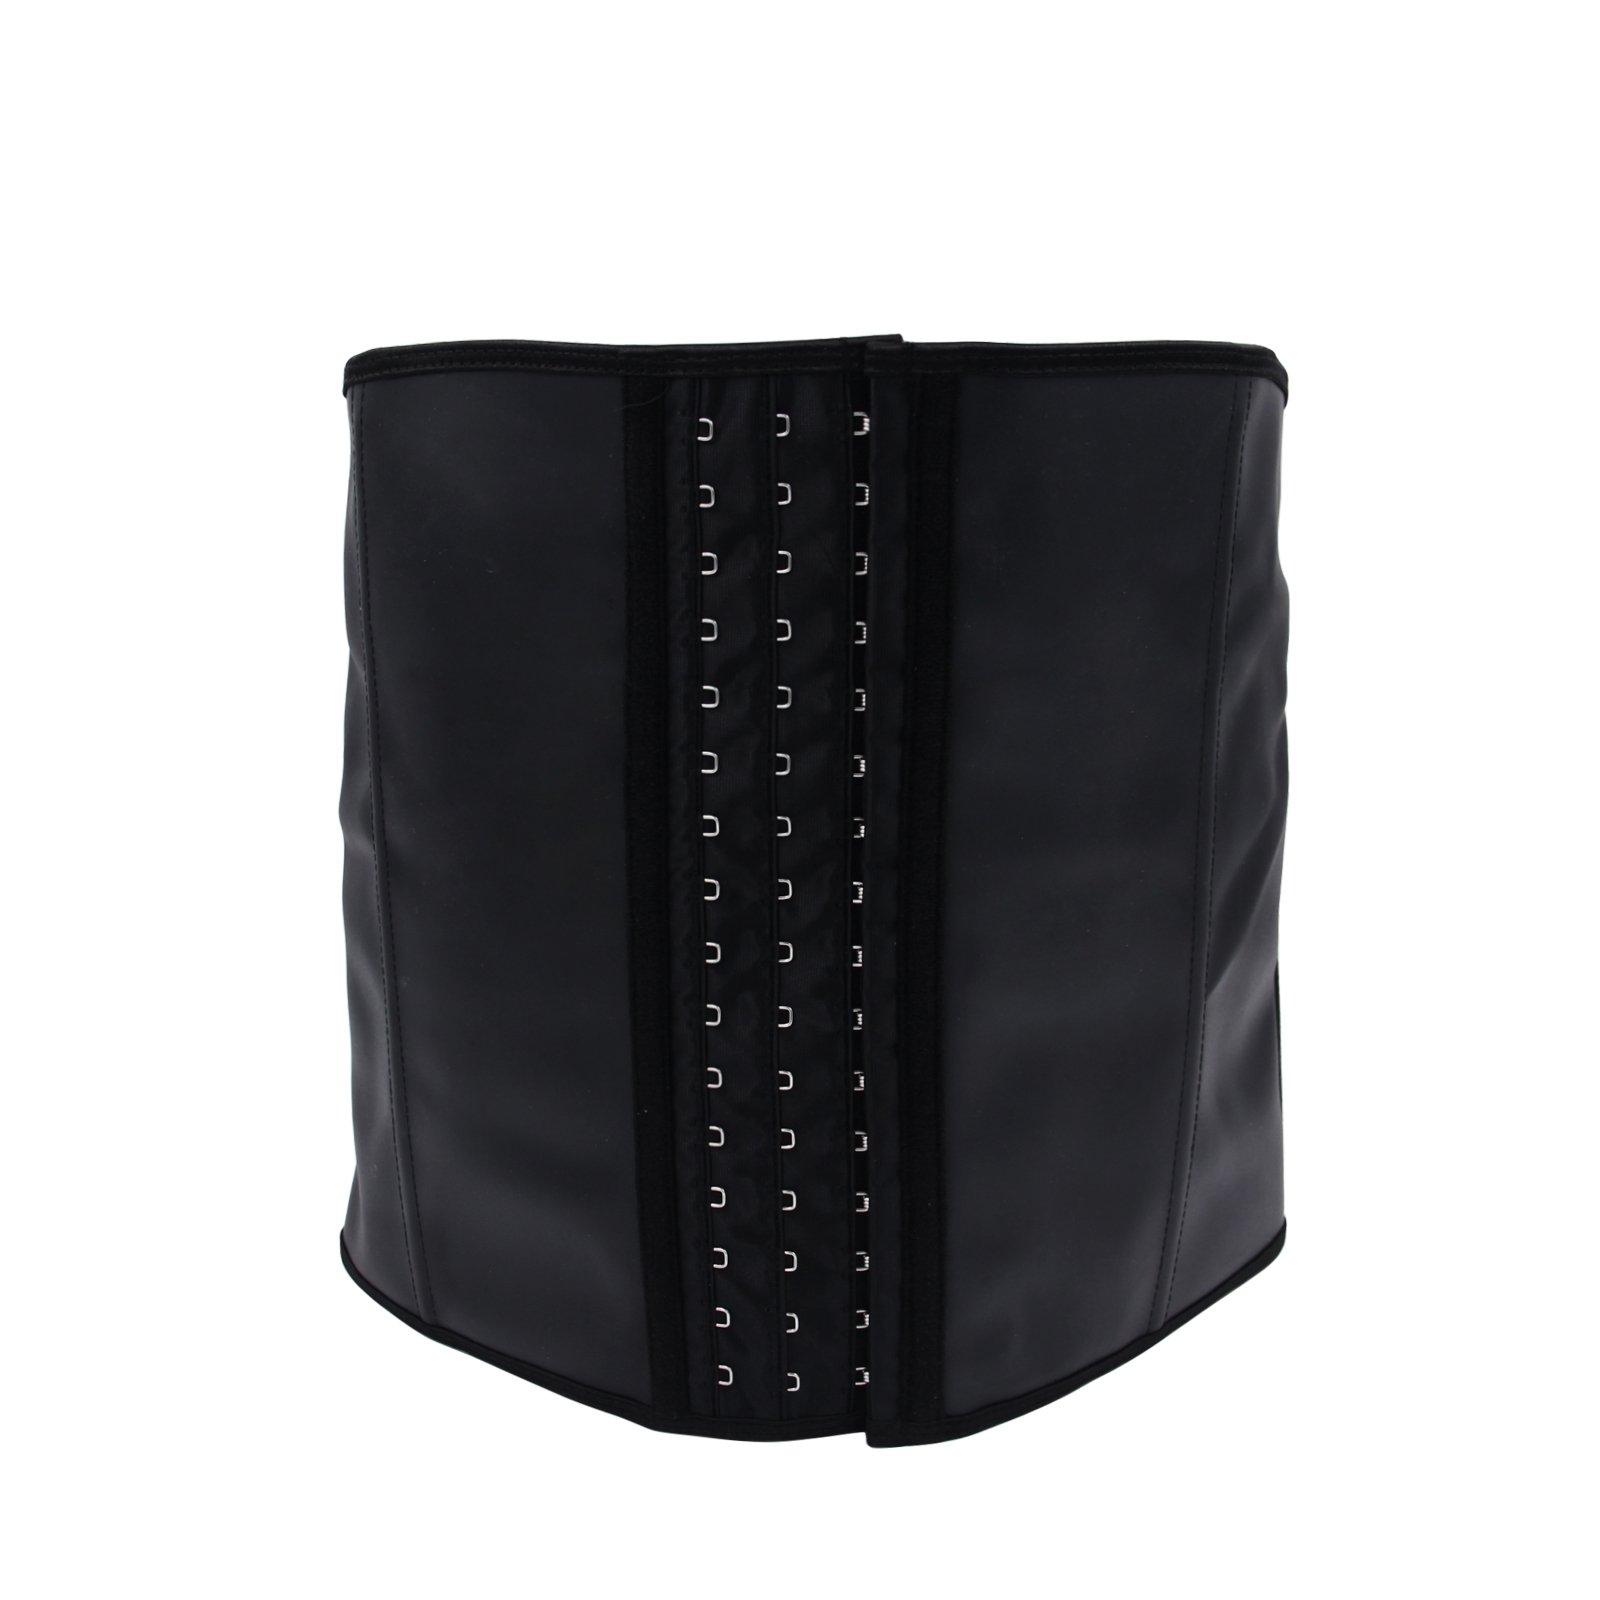 Imurz Men's Tummy Control Steel Boned Waist Trainer Workout Sport Shapewear (Black, 5XL)